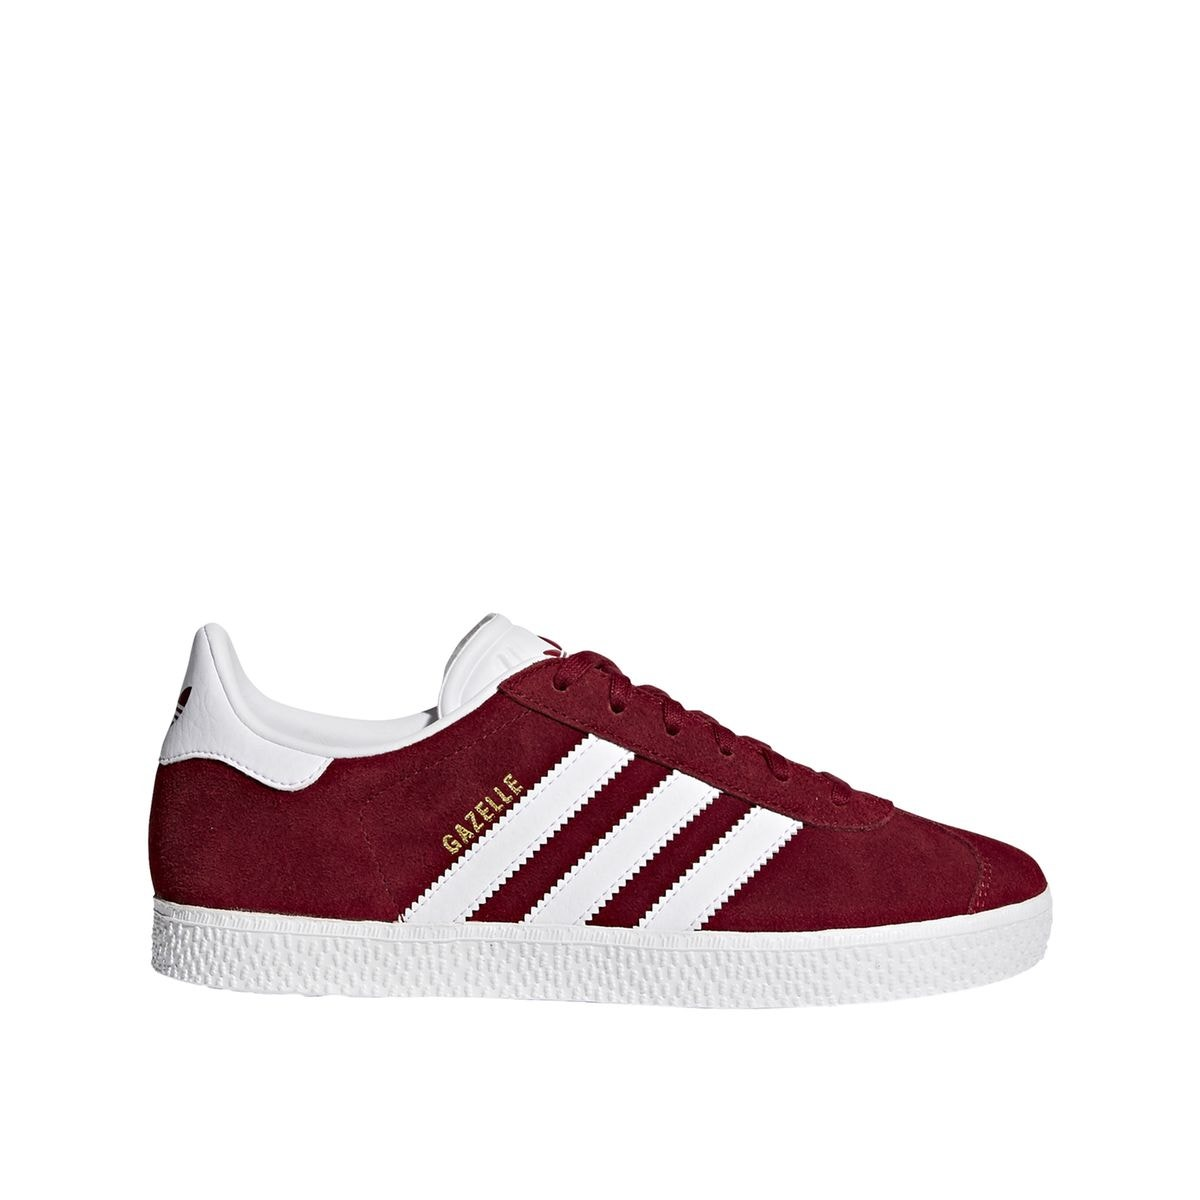 Adidas gazelle rouge enfant   La Redoute